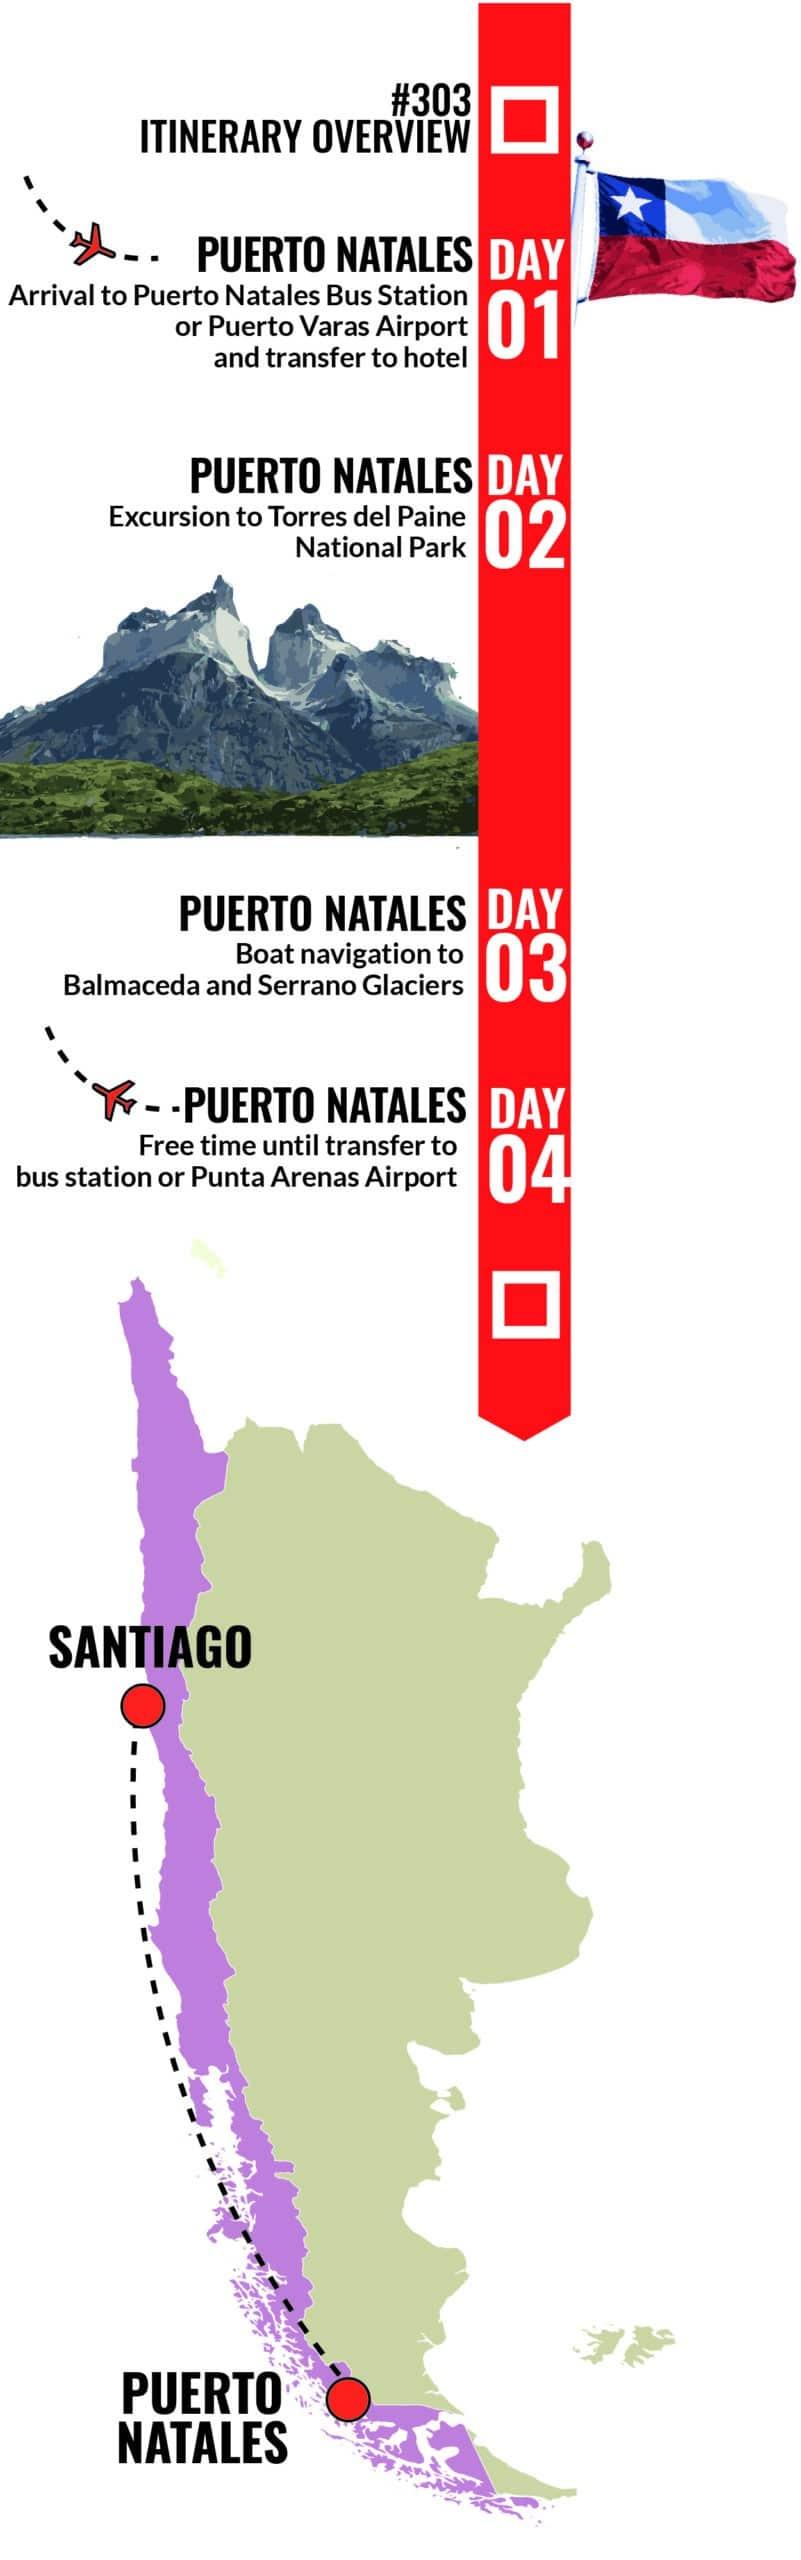 Puerto Natales Basic Program, by RipioTurismo DMC for South America